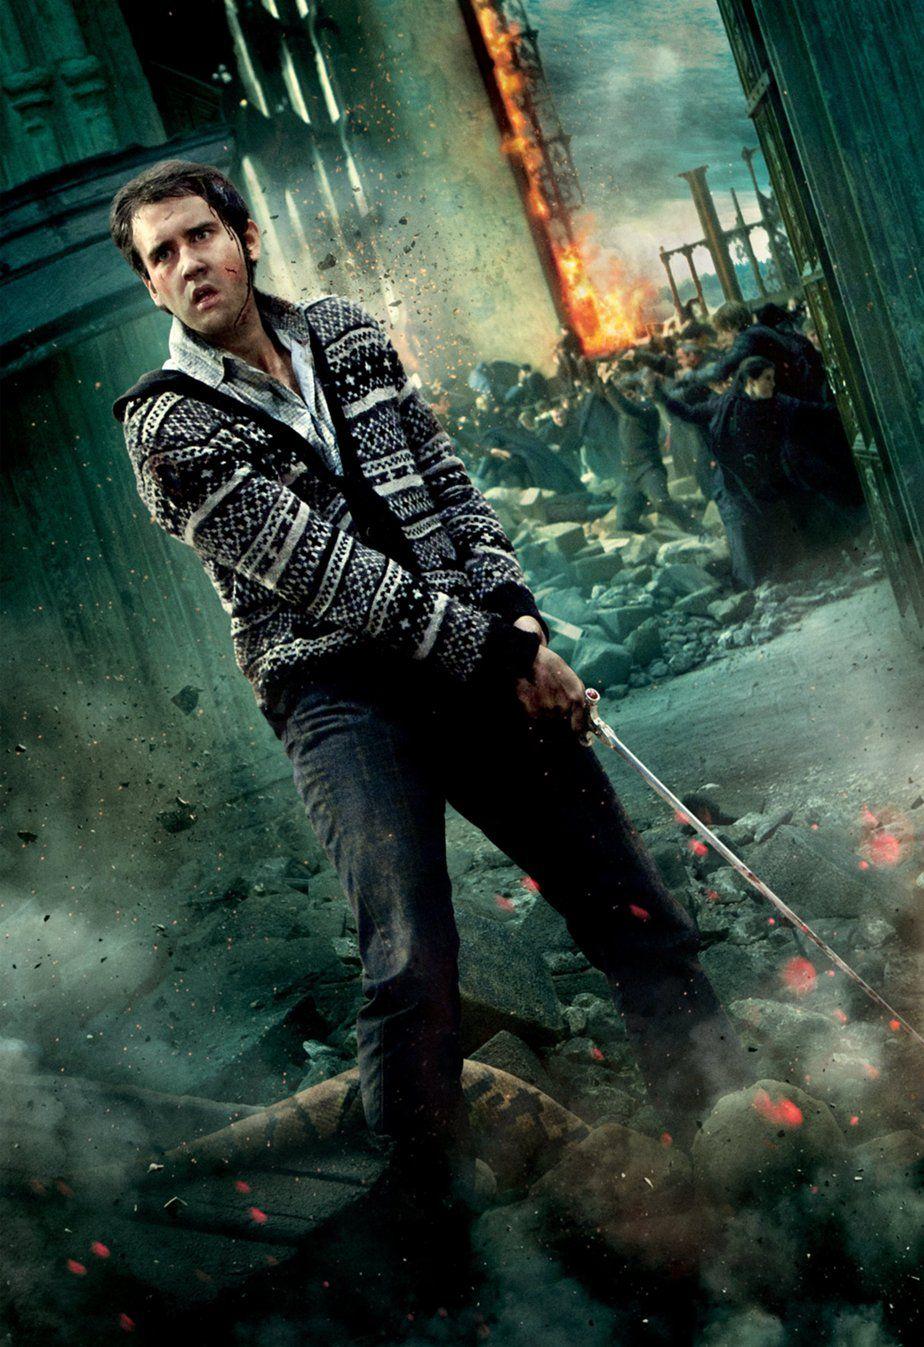 Postery Filma Garri Potter I Dary Smerti Chast 2 Harry Potter Poster Harry Potter Movies Neville Longbottom